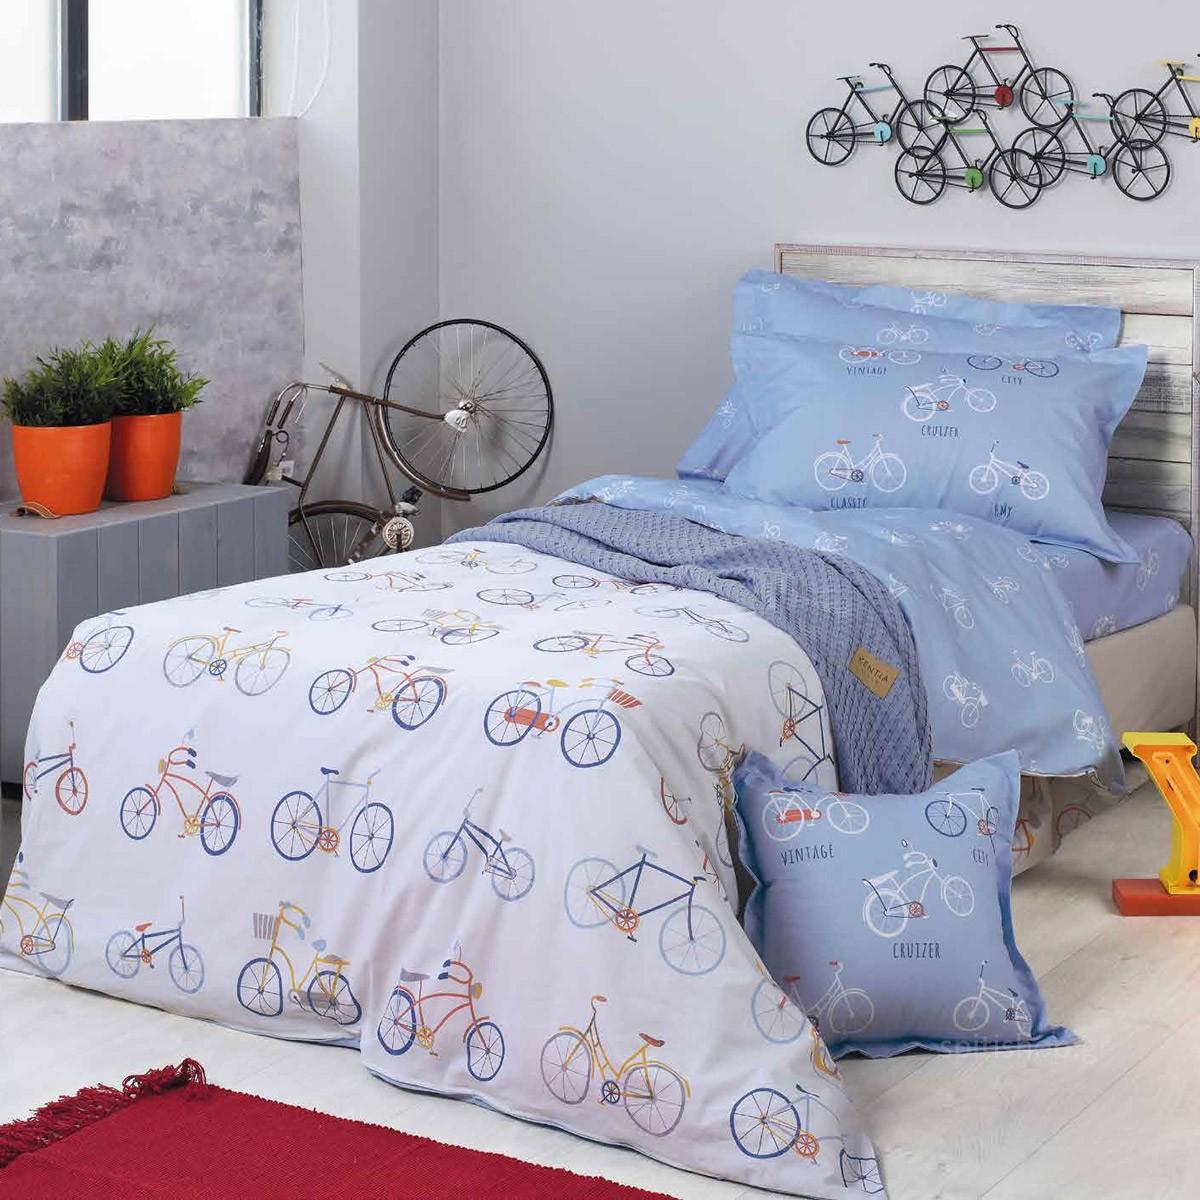 576656a93bd Σπίτι > Παιδικό Δωμάτιο > Λευκά Είδη > Σεντόνια / Σεντόνια Σετ Μονά ...